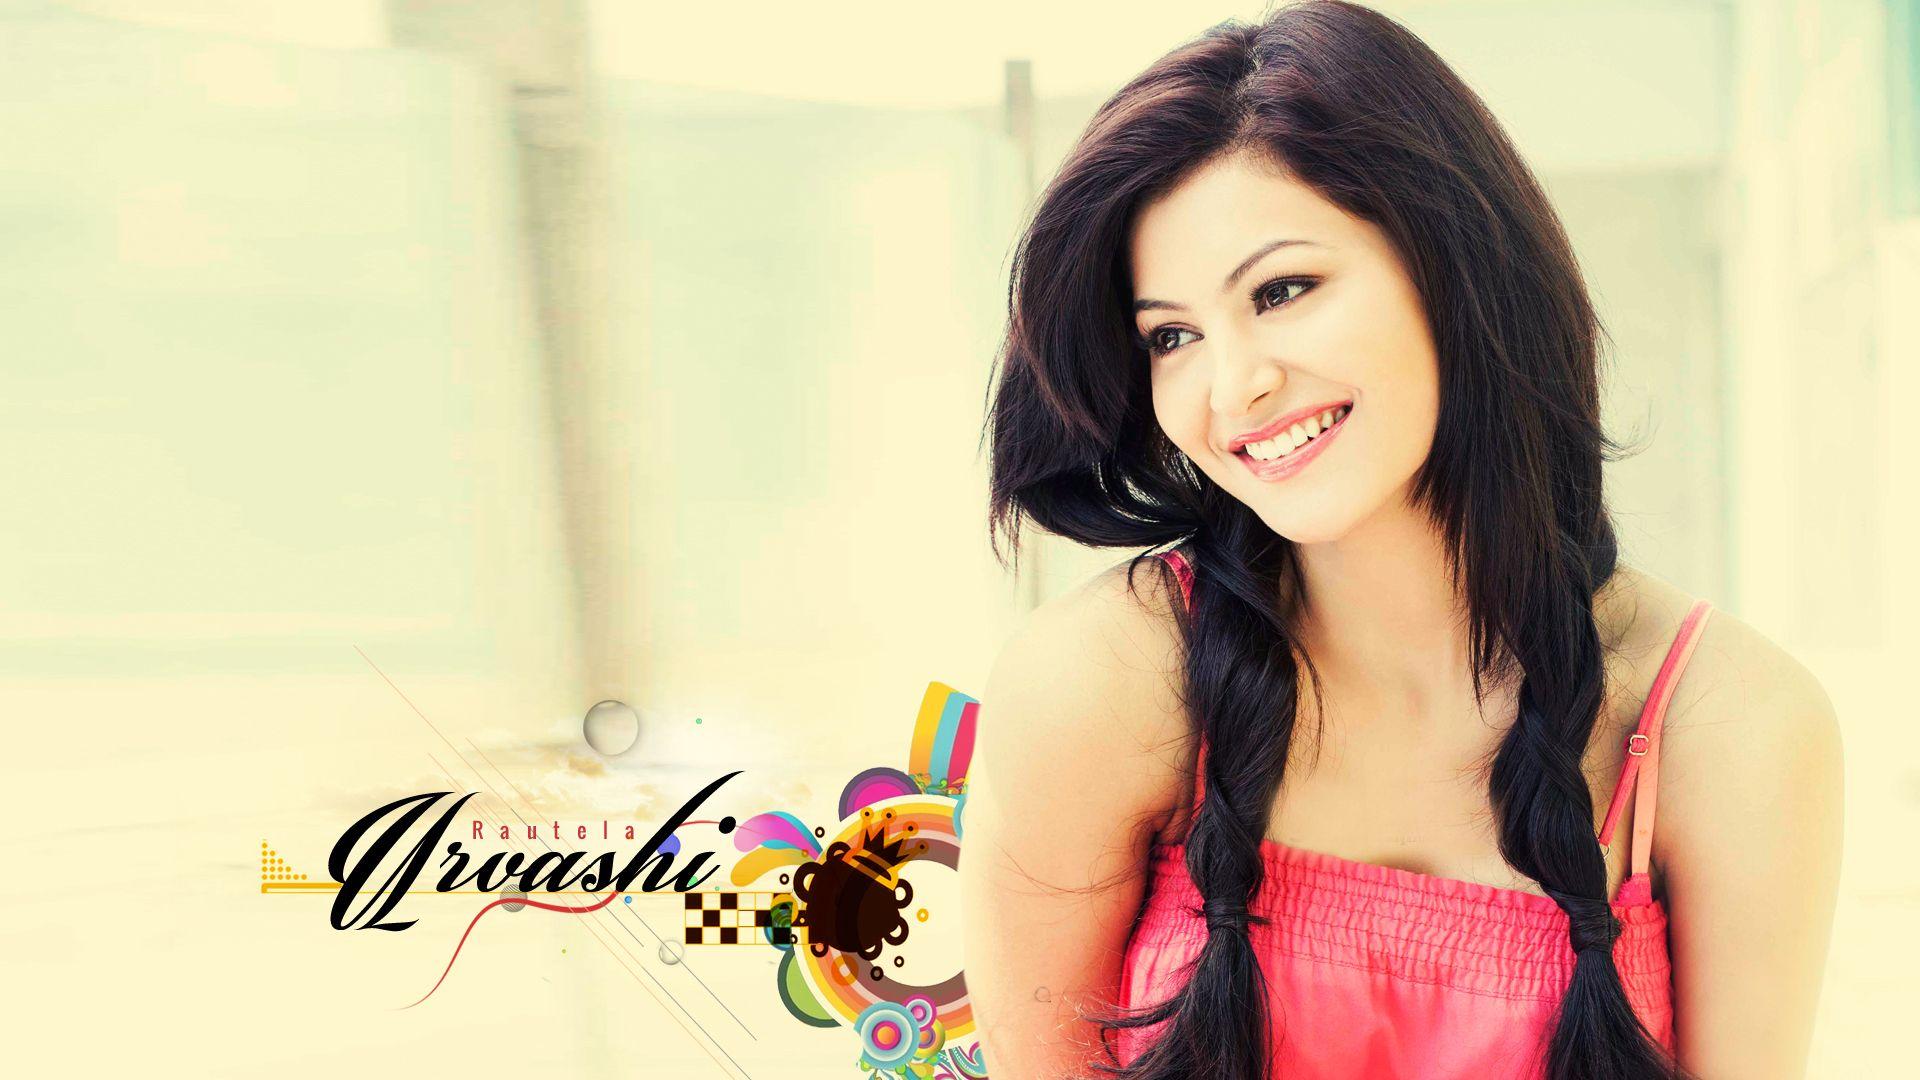 Urvashi Rautela Cute Smile Hd Wallpaper Urvashi Rautela